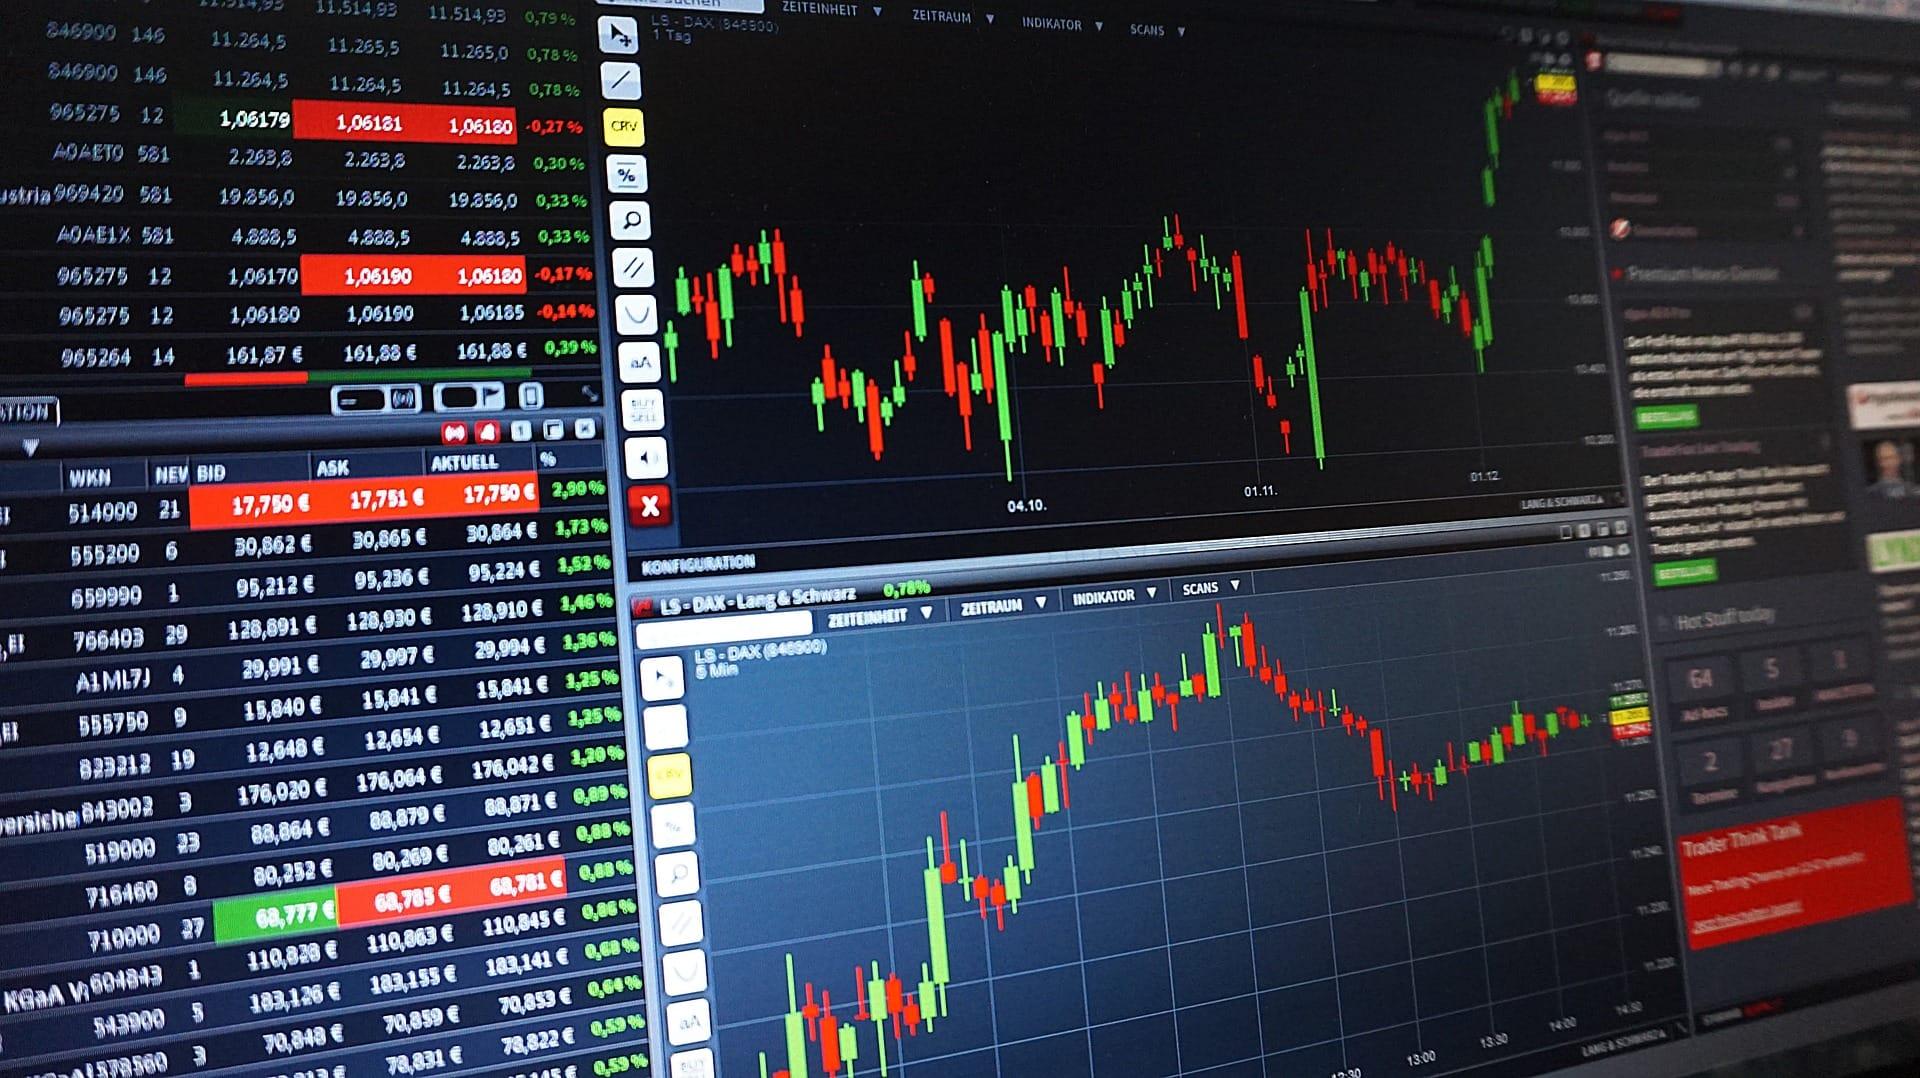 Aktier – grunderna i teknisk analys av aktier